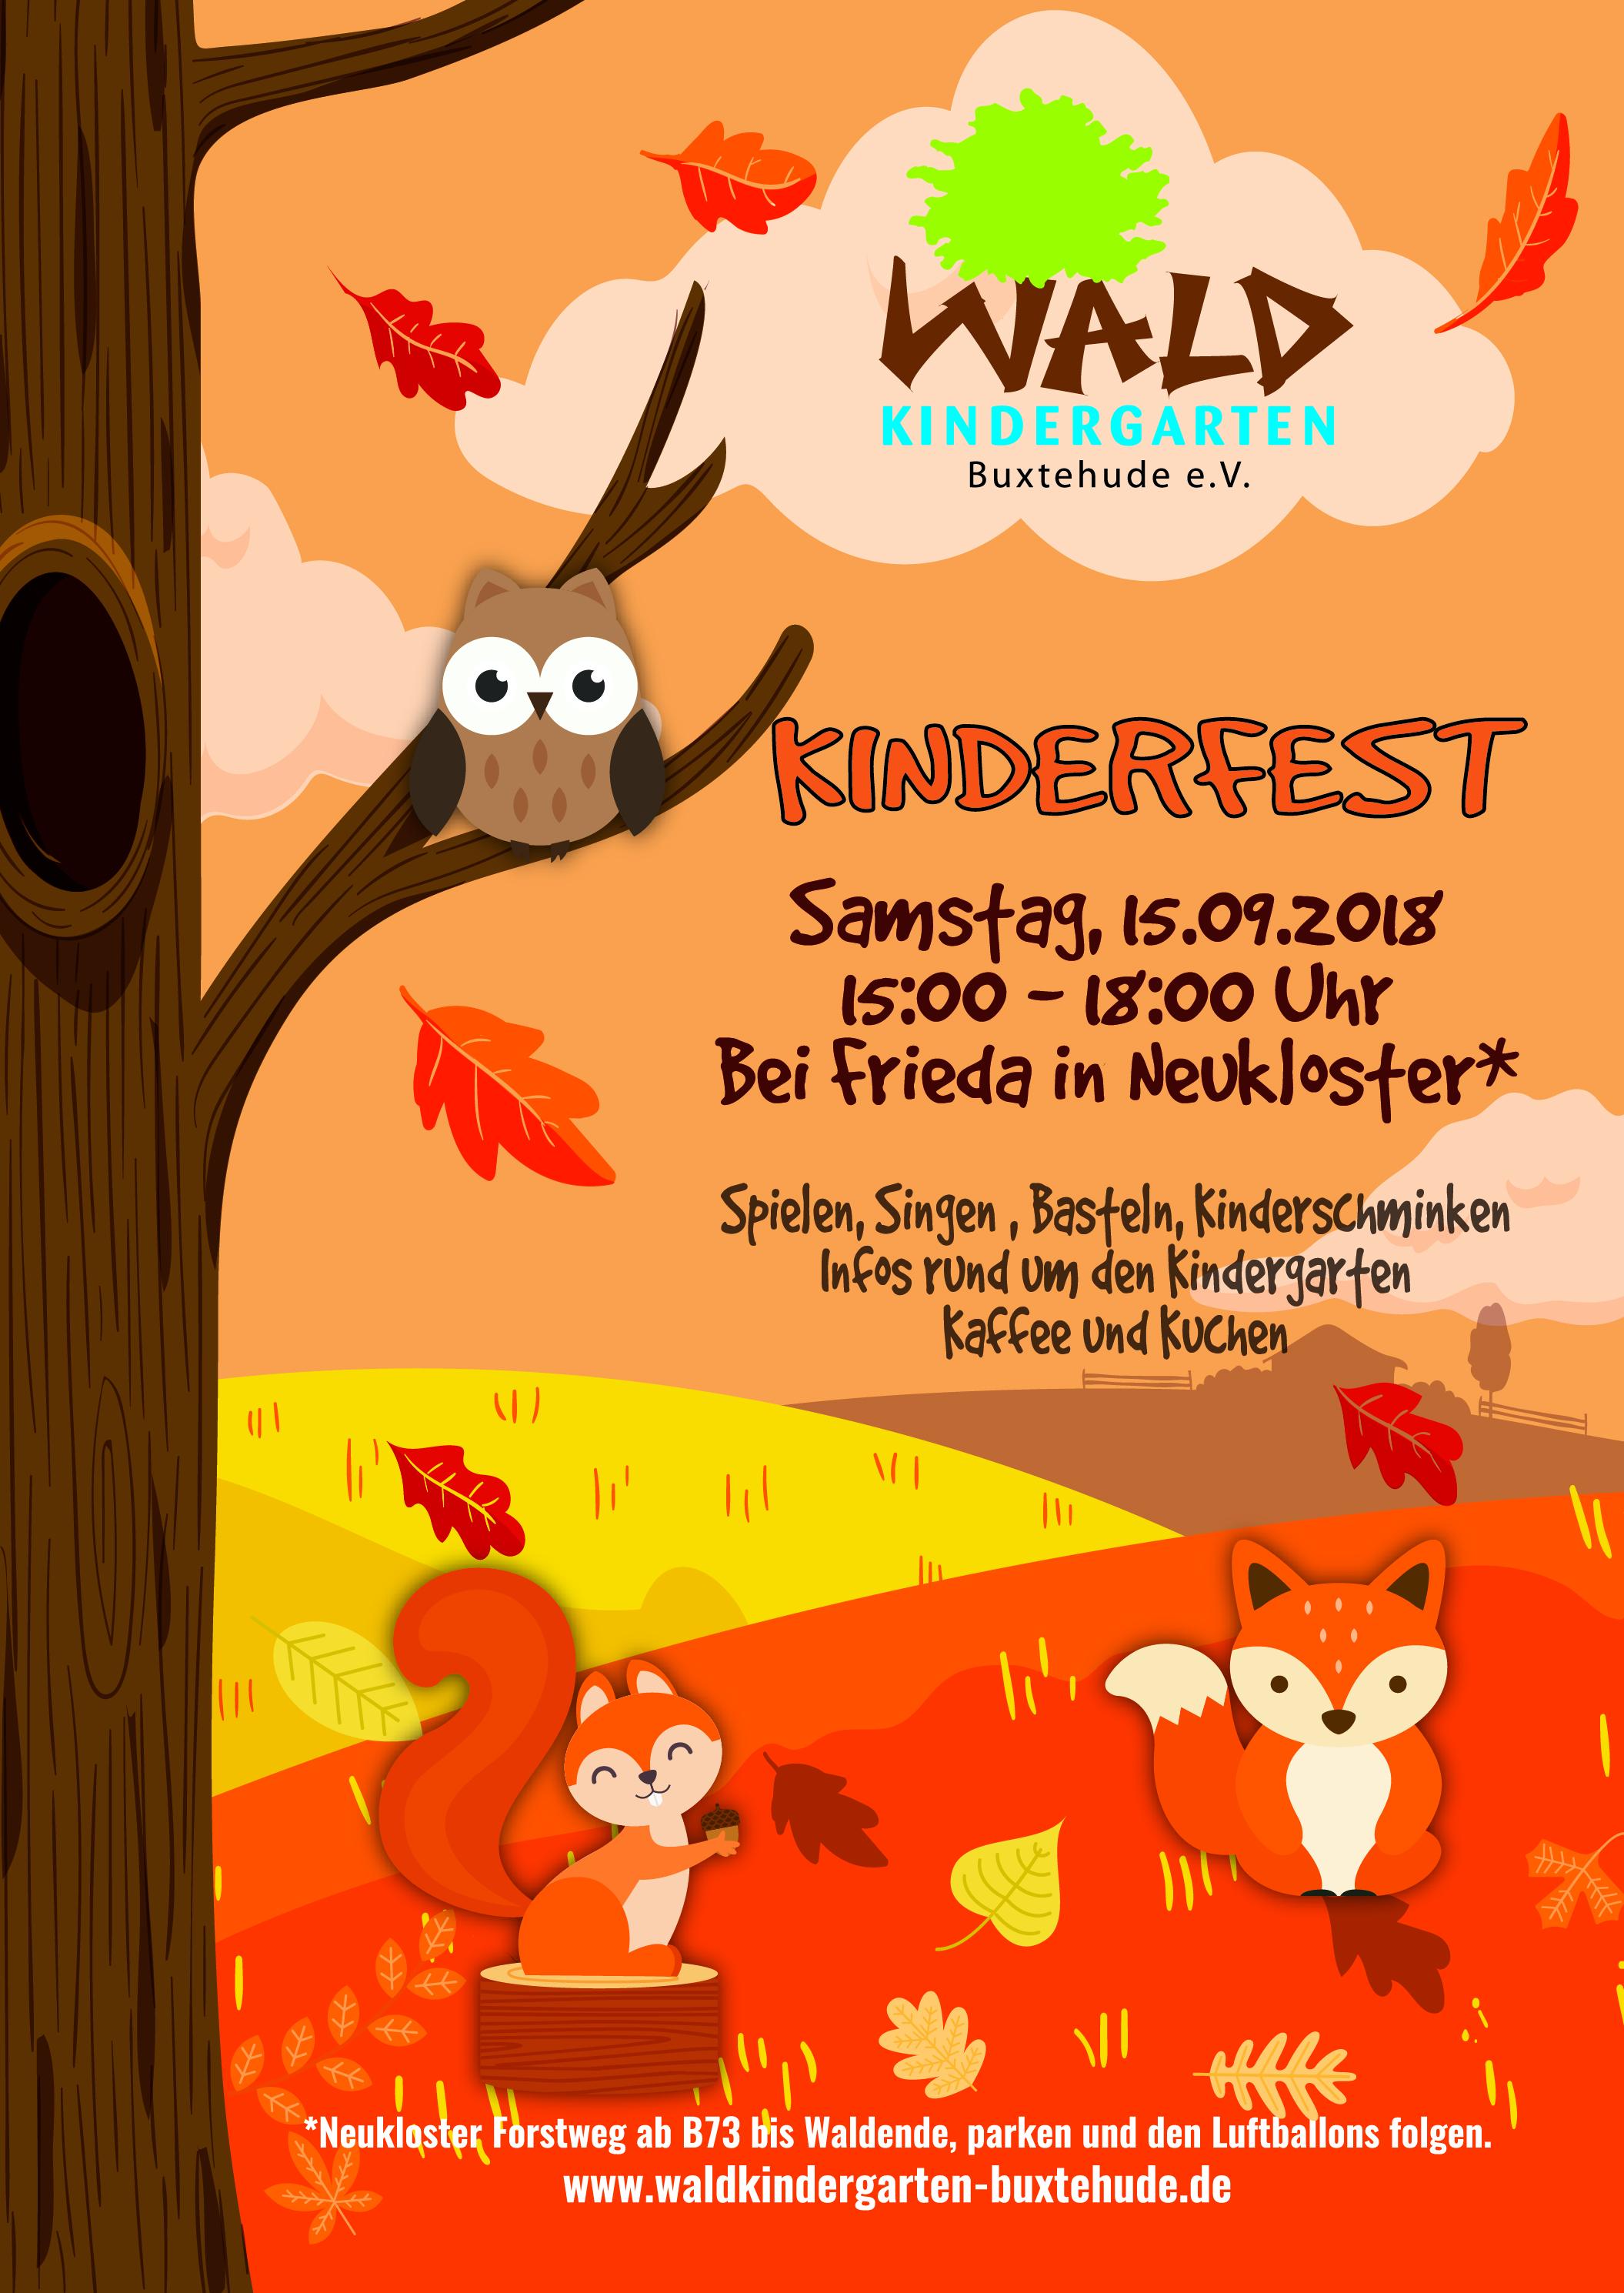 Kinderfest im Herbst Waldkindergarten Buxtehude